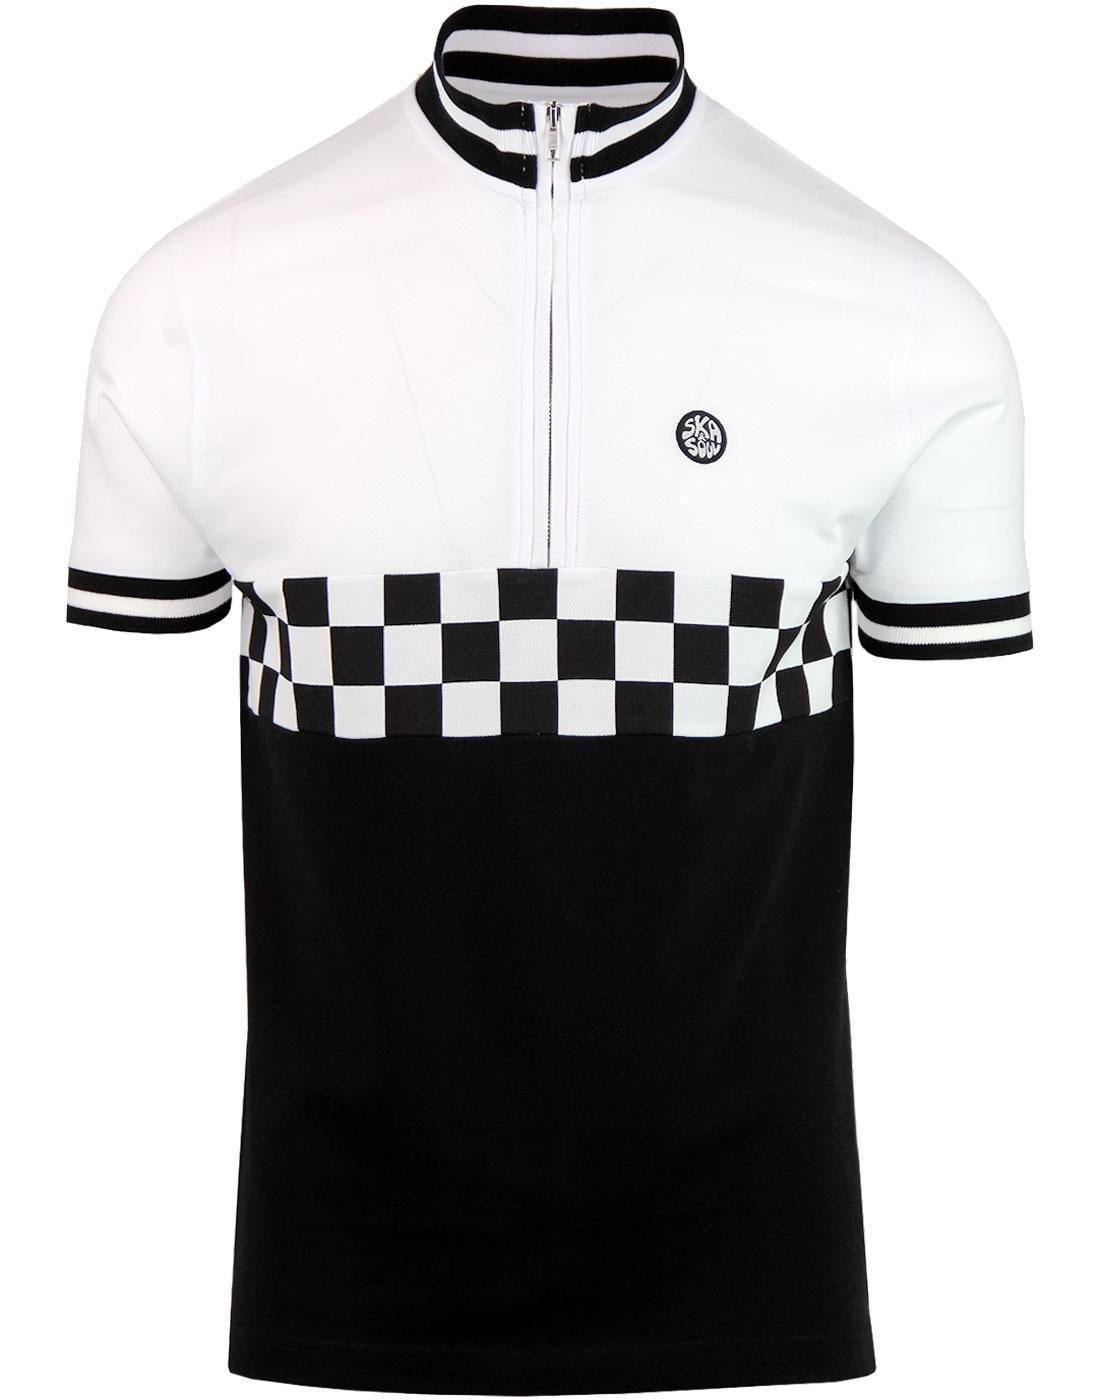 SKA & SOUL Mod Checkerboard Pique Cycling Top W